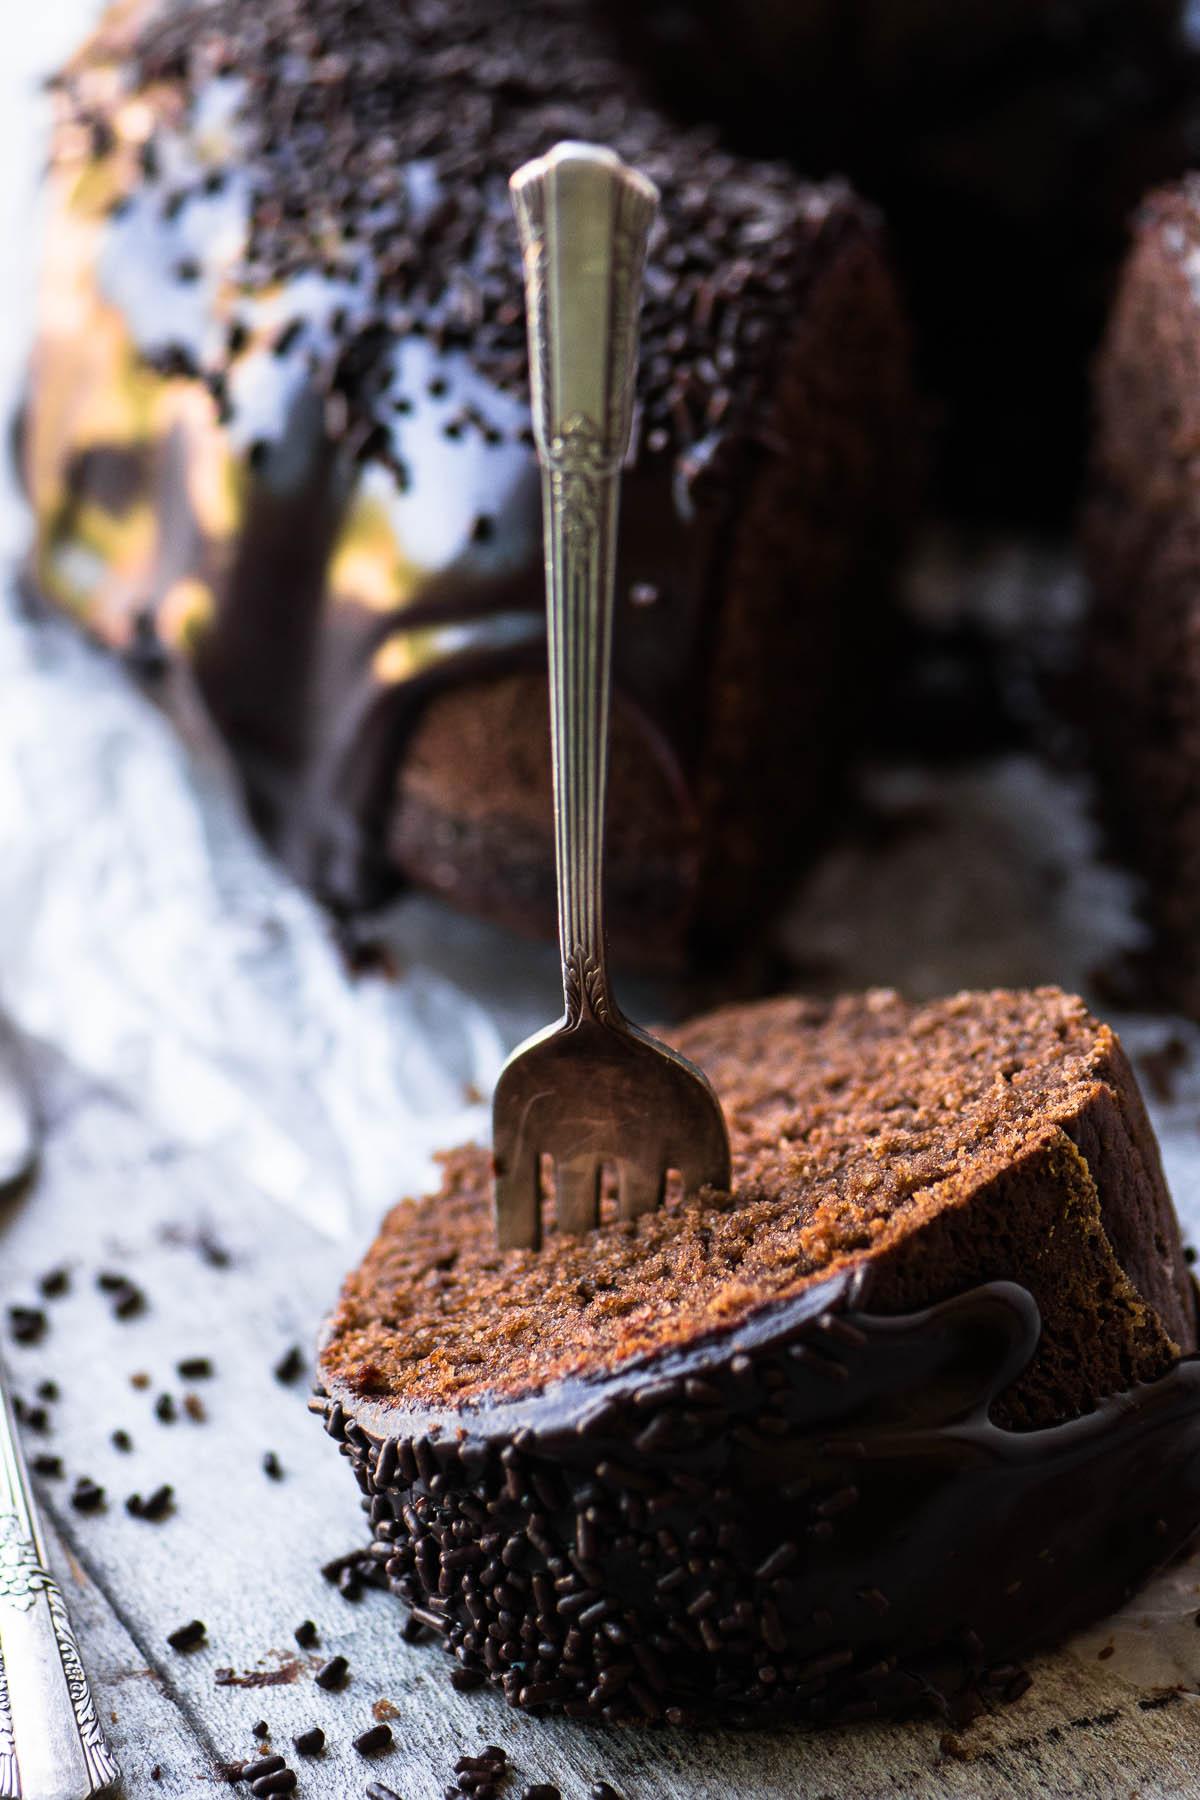 A slice of Chocolate Sour Cream Doughnut Bundt cake with a fork